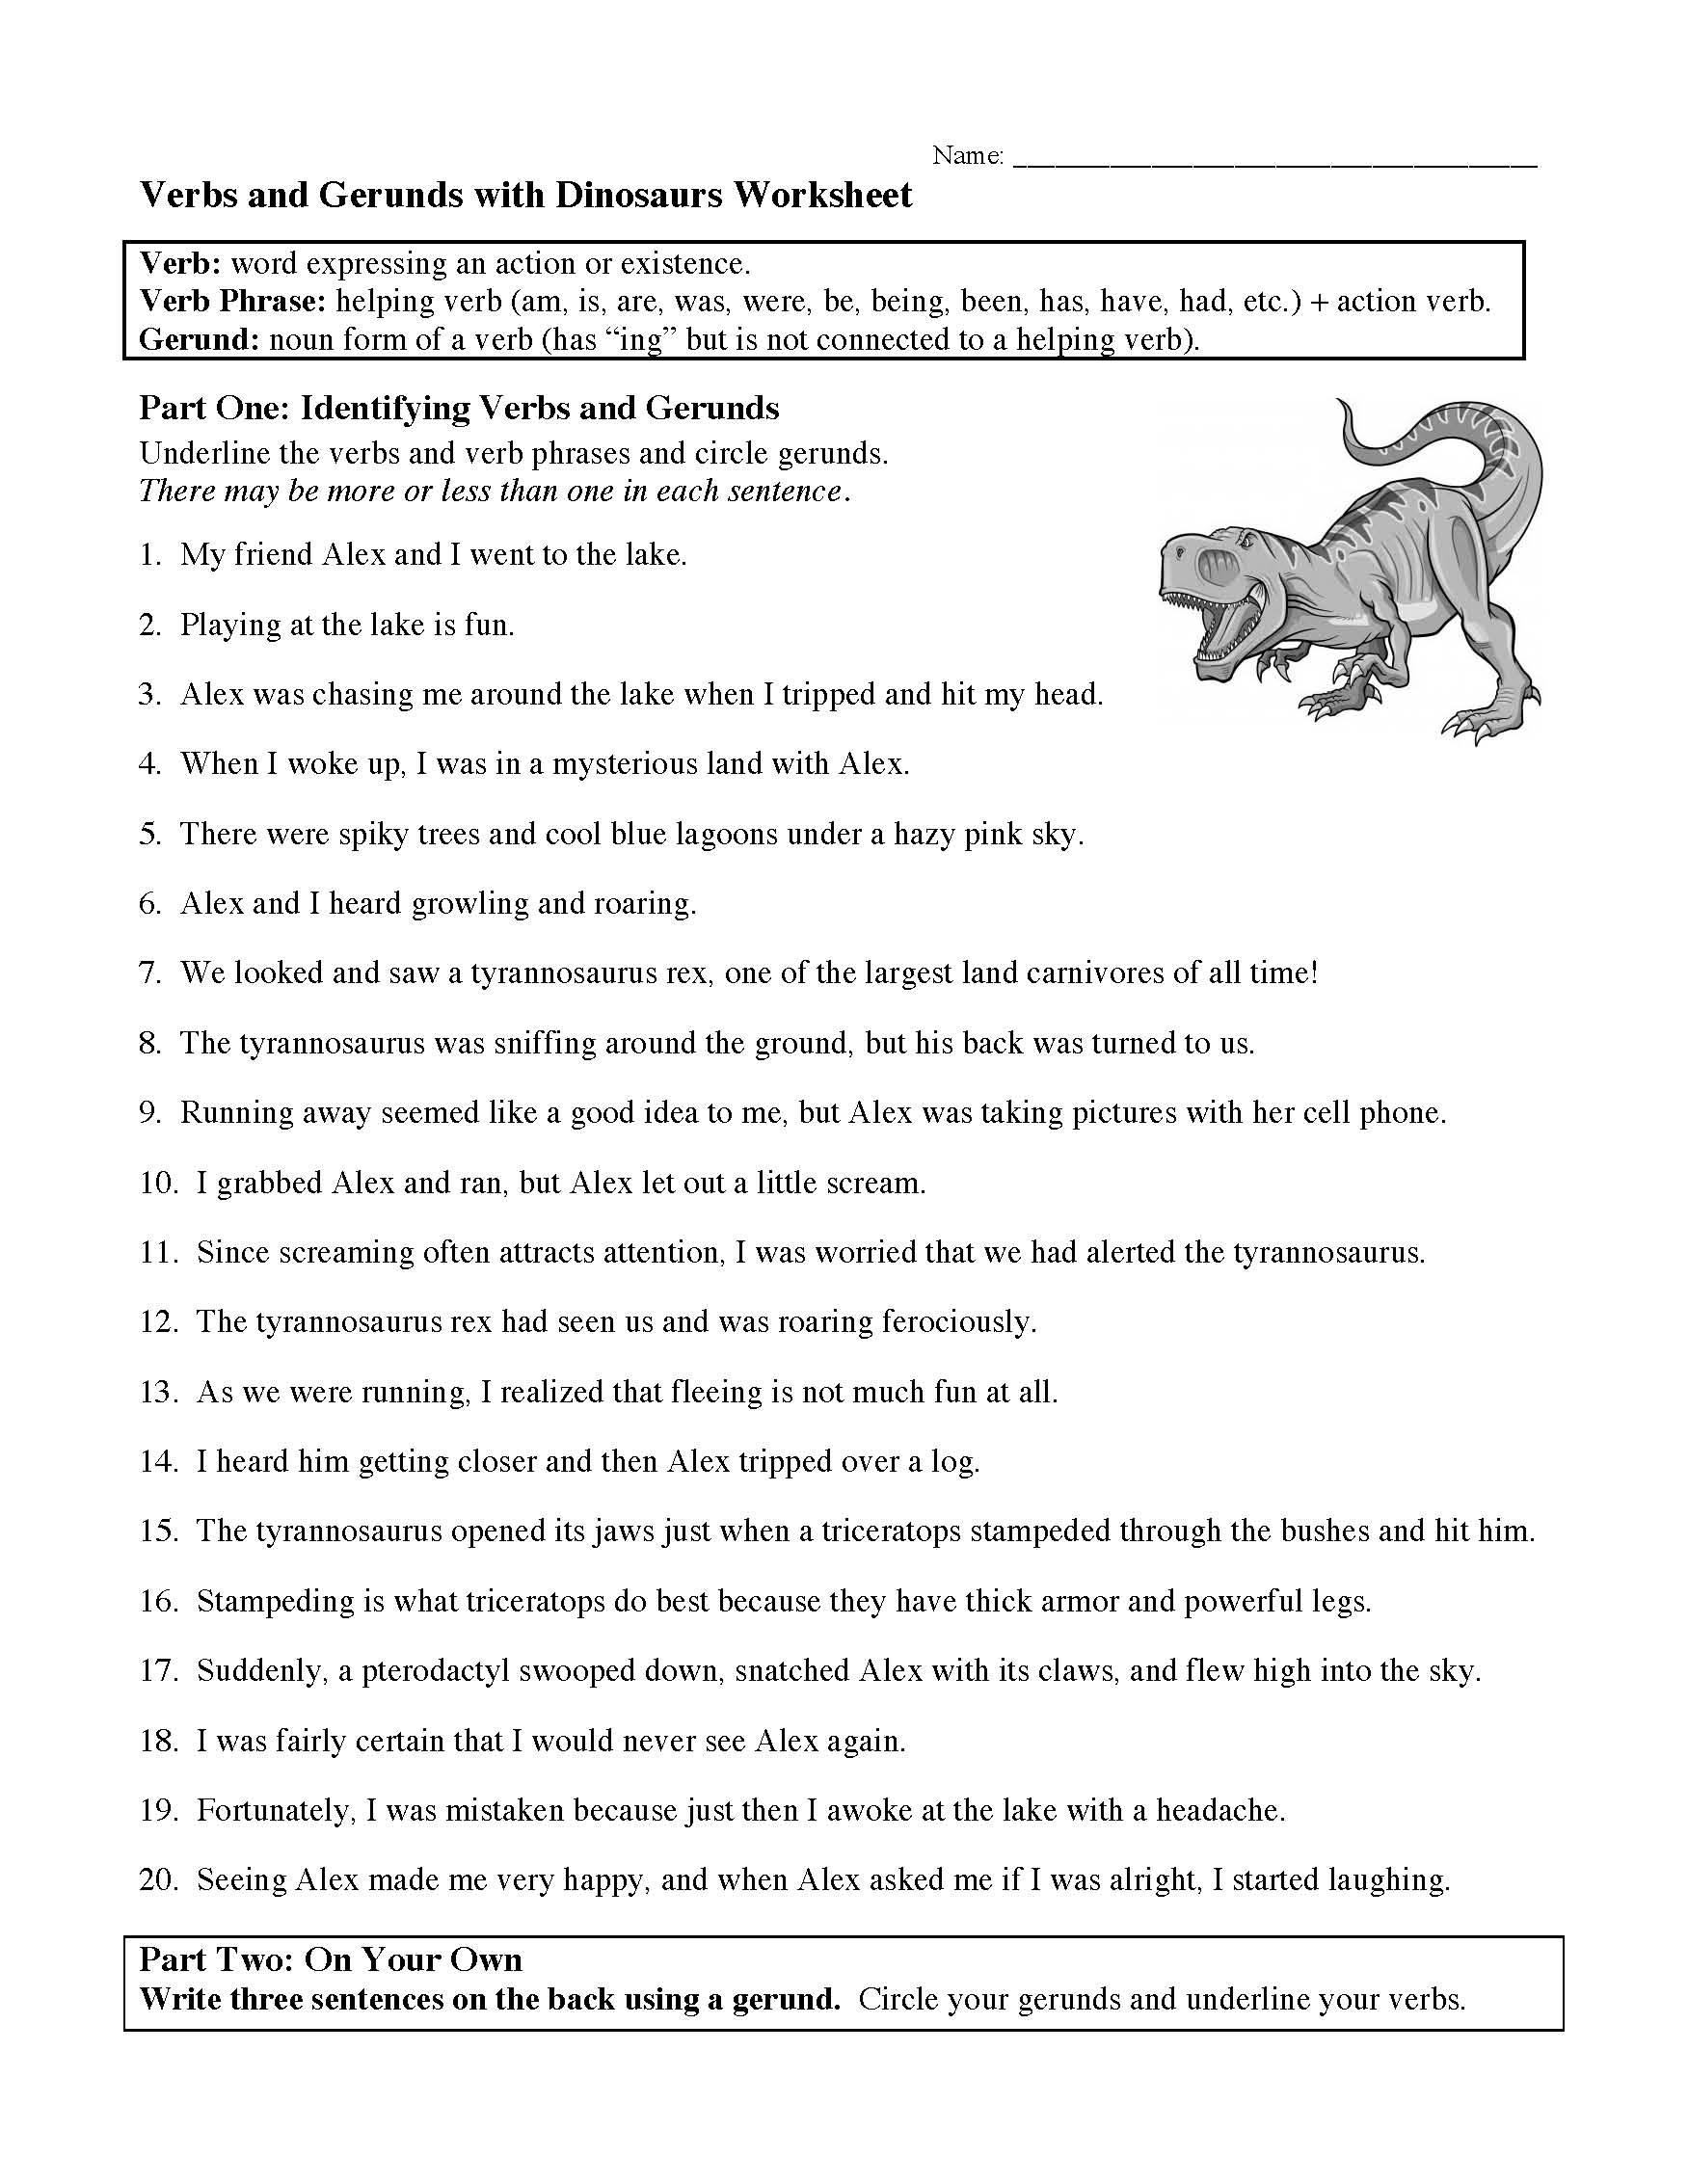 Verbs Verbs Of Being And Gerunds Worksheet